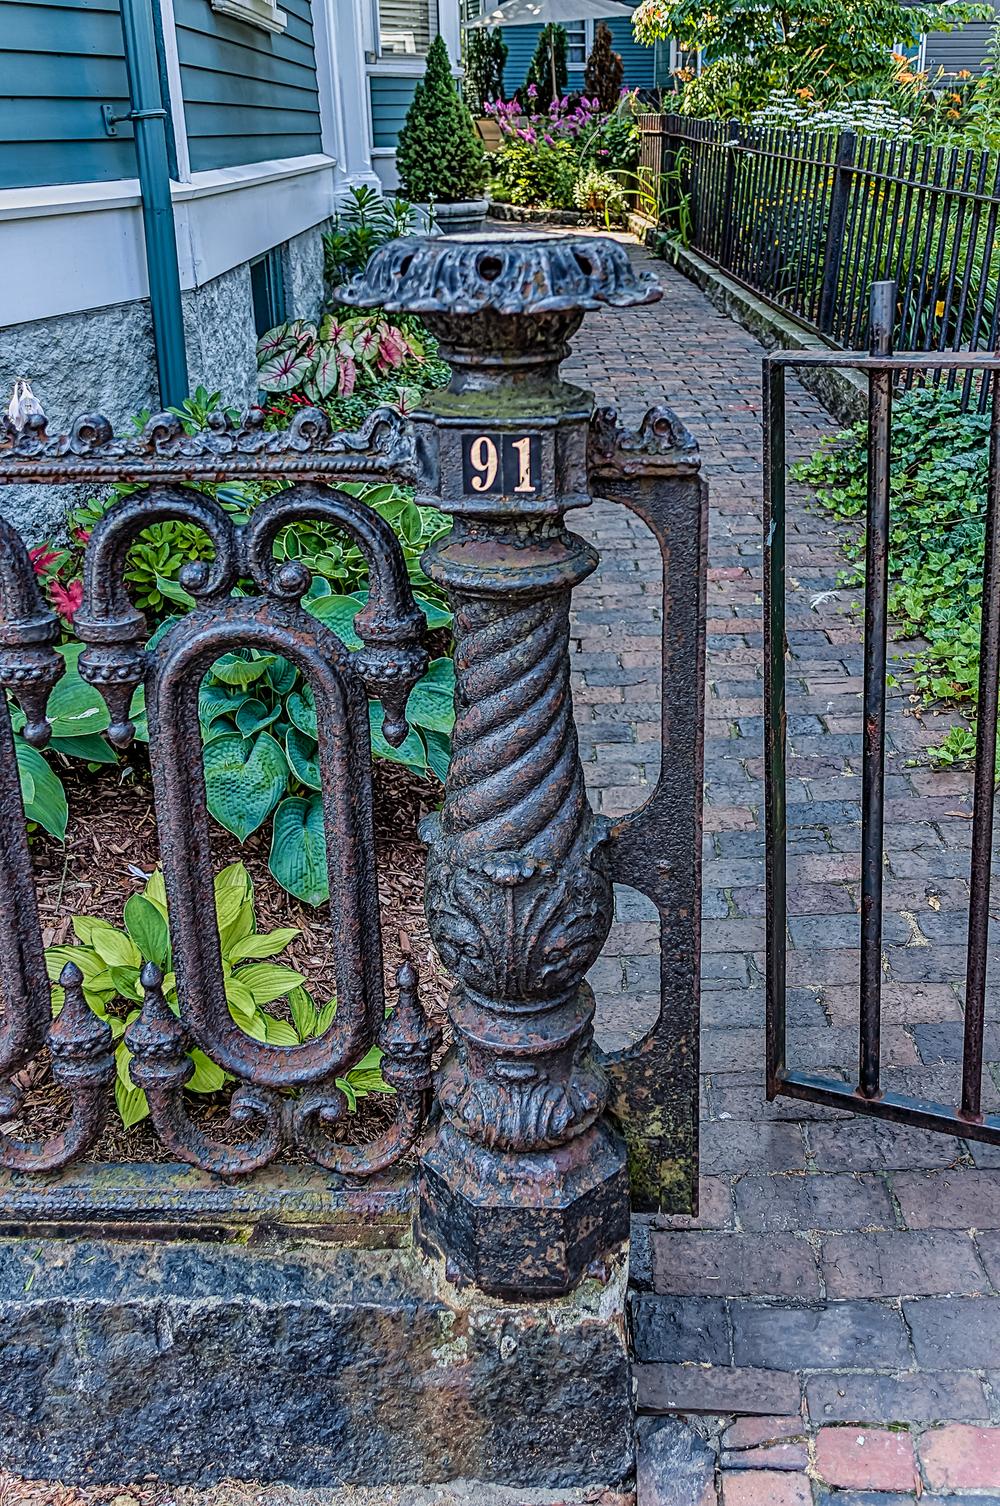 20140723_Boston-Vacation 2014_IMG_5408_HDR copy.jpg